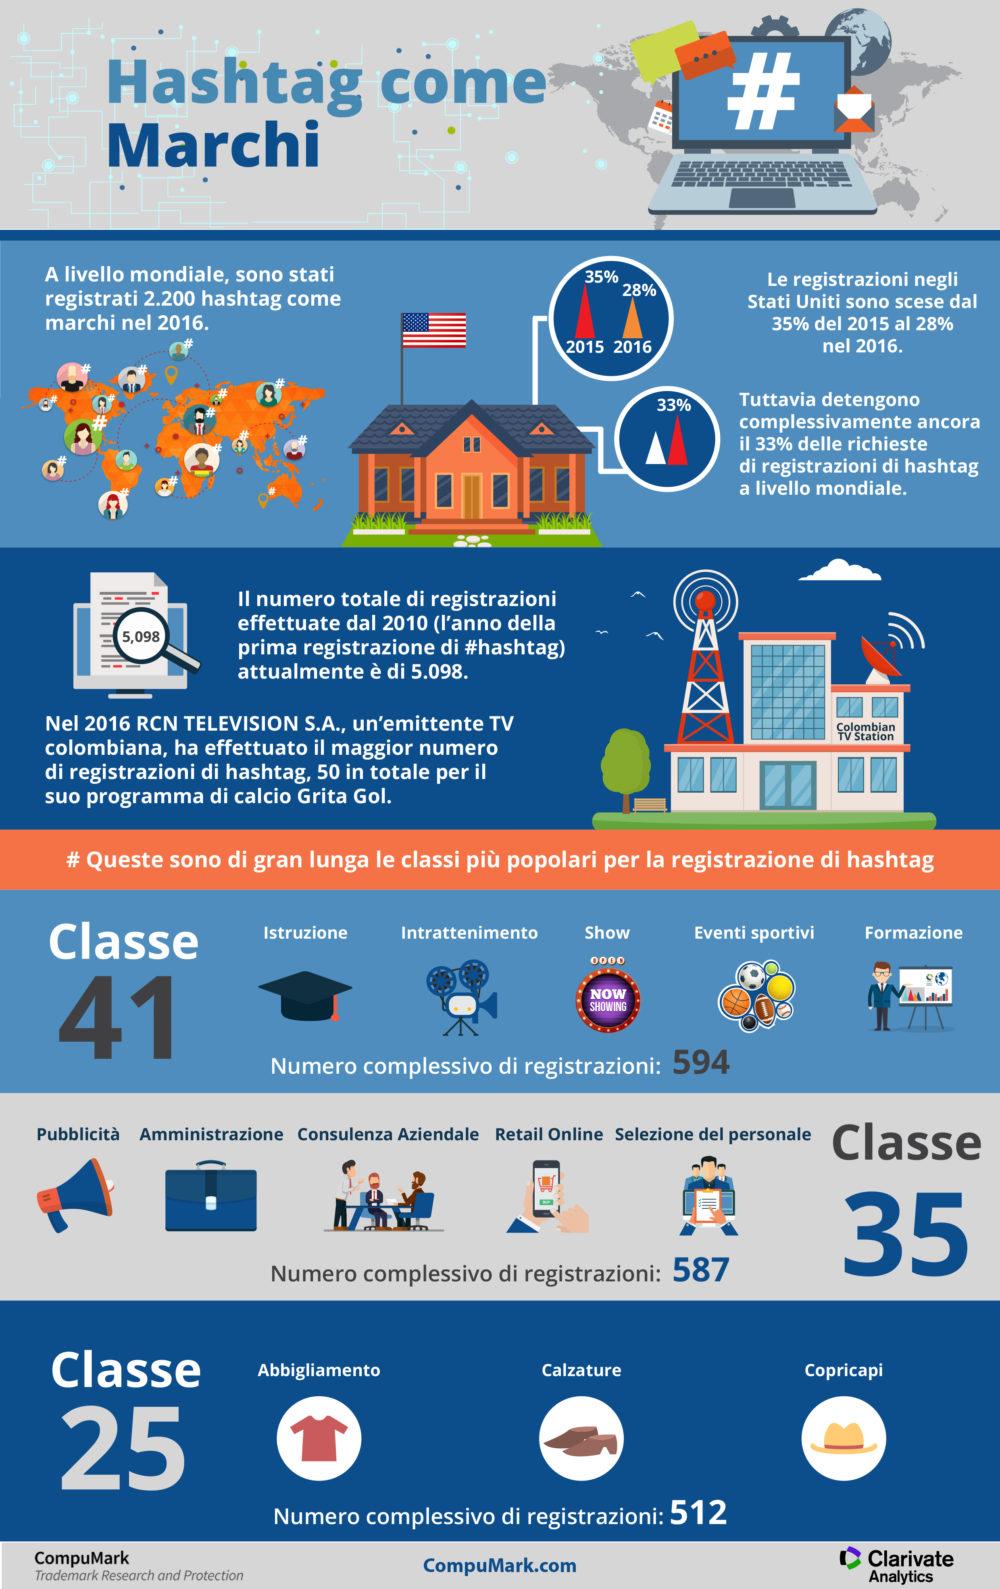 FINAL CM Hashtag Infographic (AI)_ITA